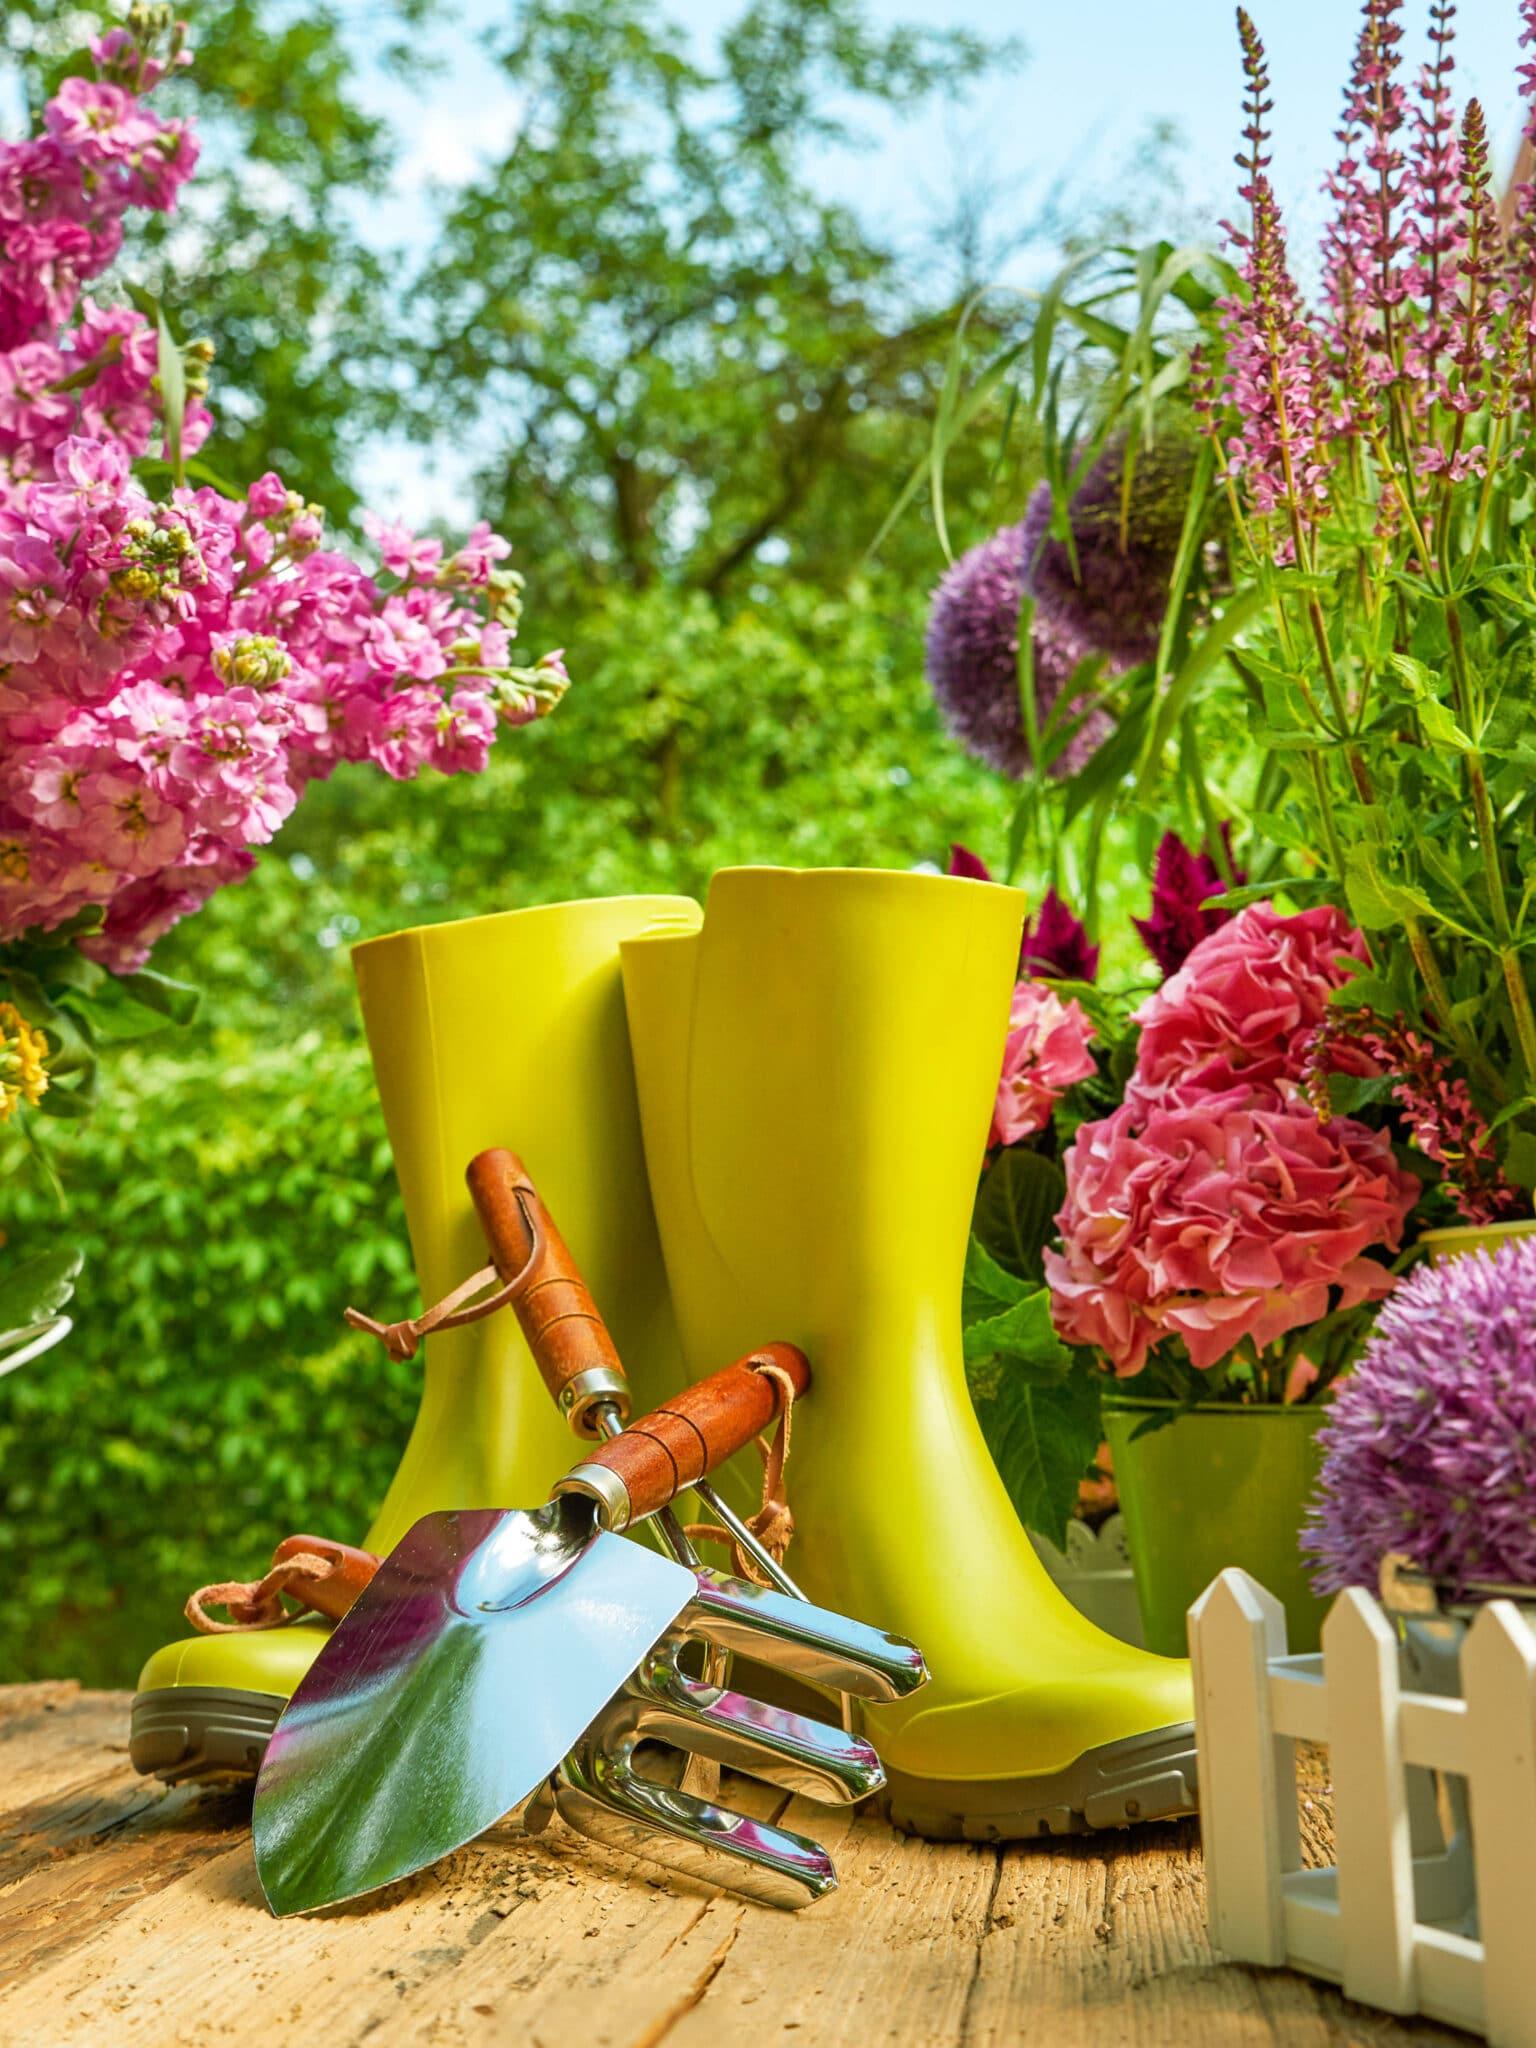 Garden tools on an outdoor table.